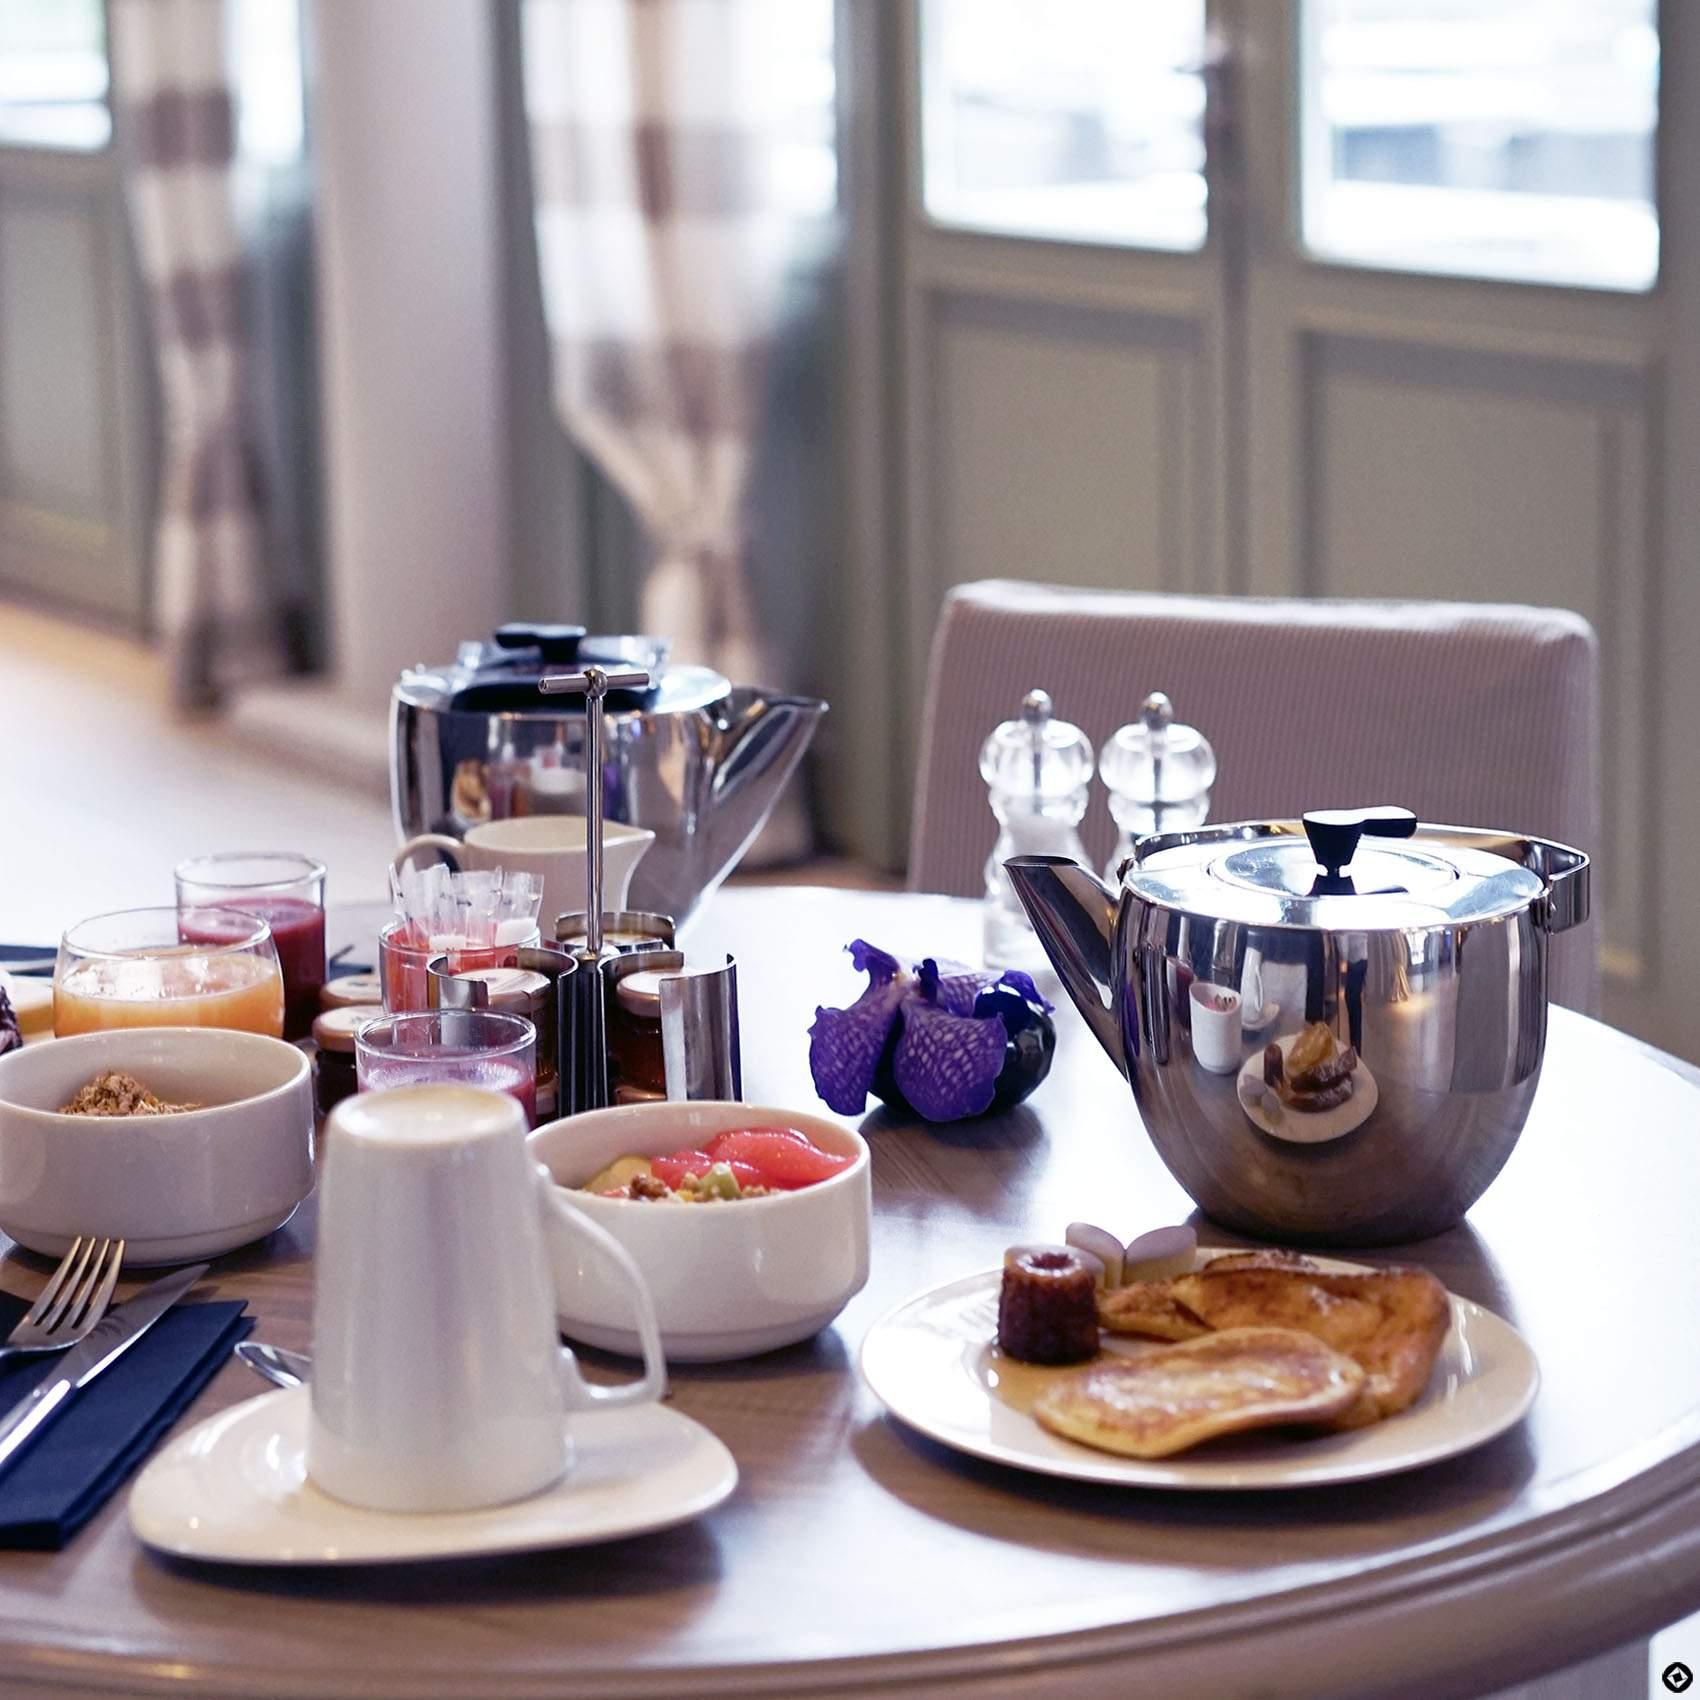 grand-hotel-roi-rene-blog-deco-design